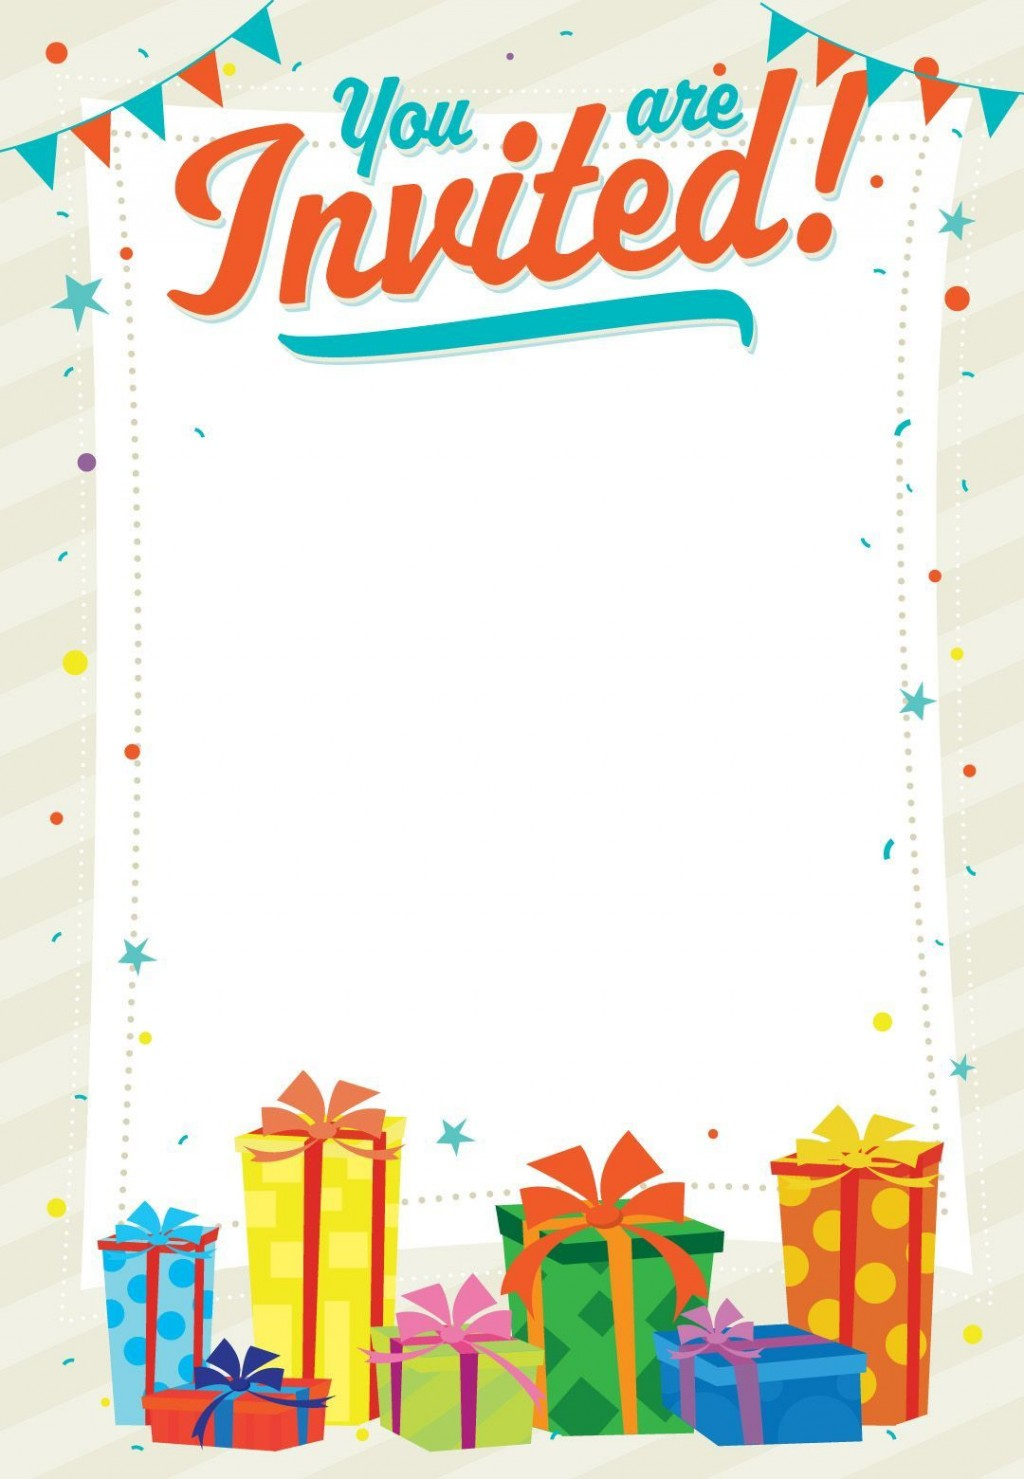 003 Imposing Free Online Printable Birthday Invitation Template Inspiration  Templates Card MakerLarge